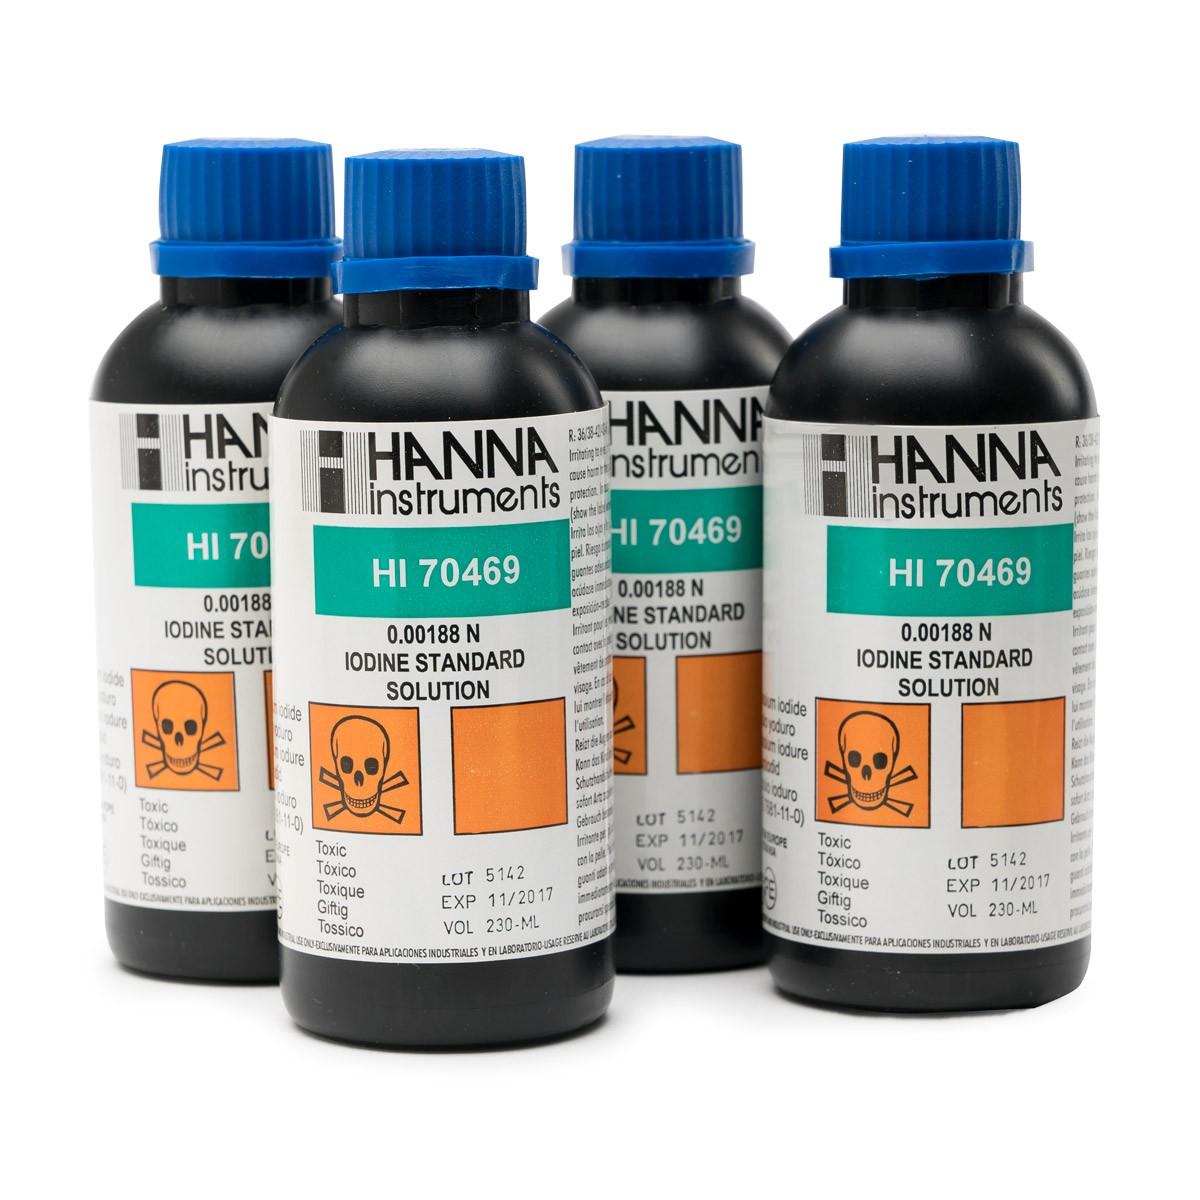 Iodine Standard Solution (0.00188 N), 4 x 250 mL - HI70469